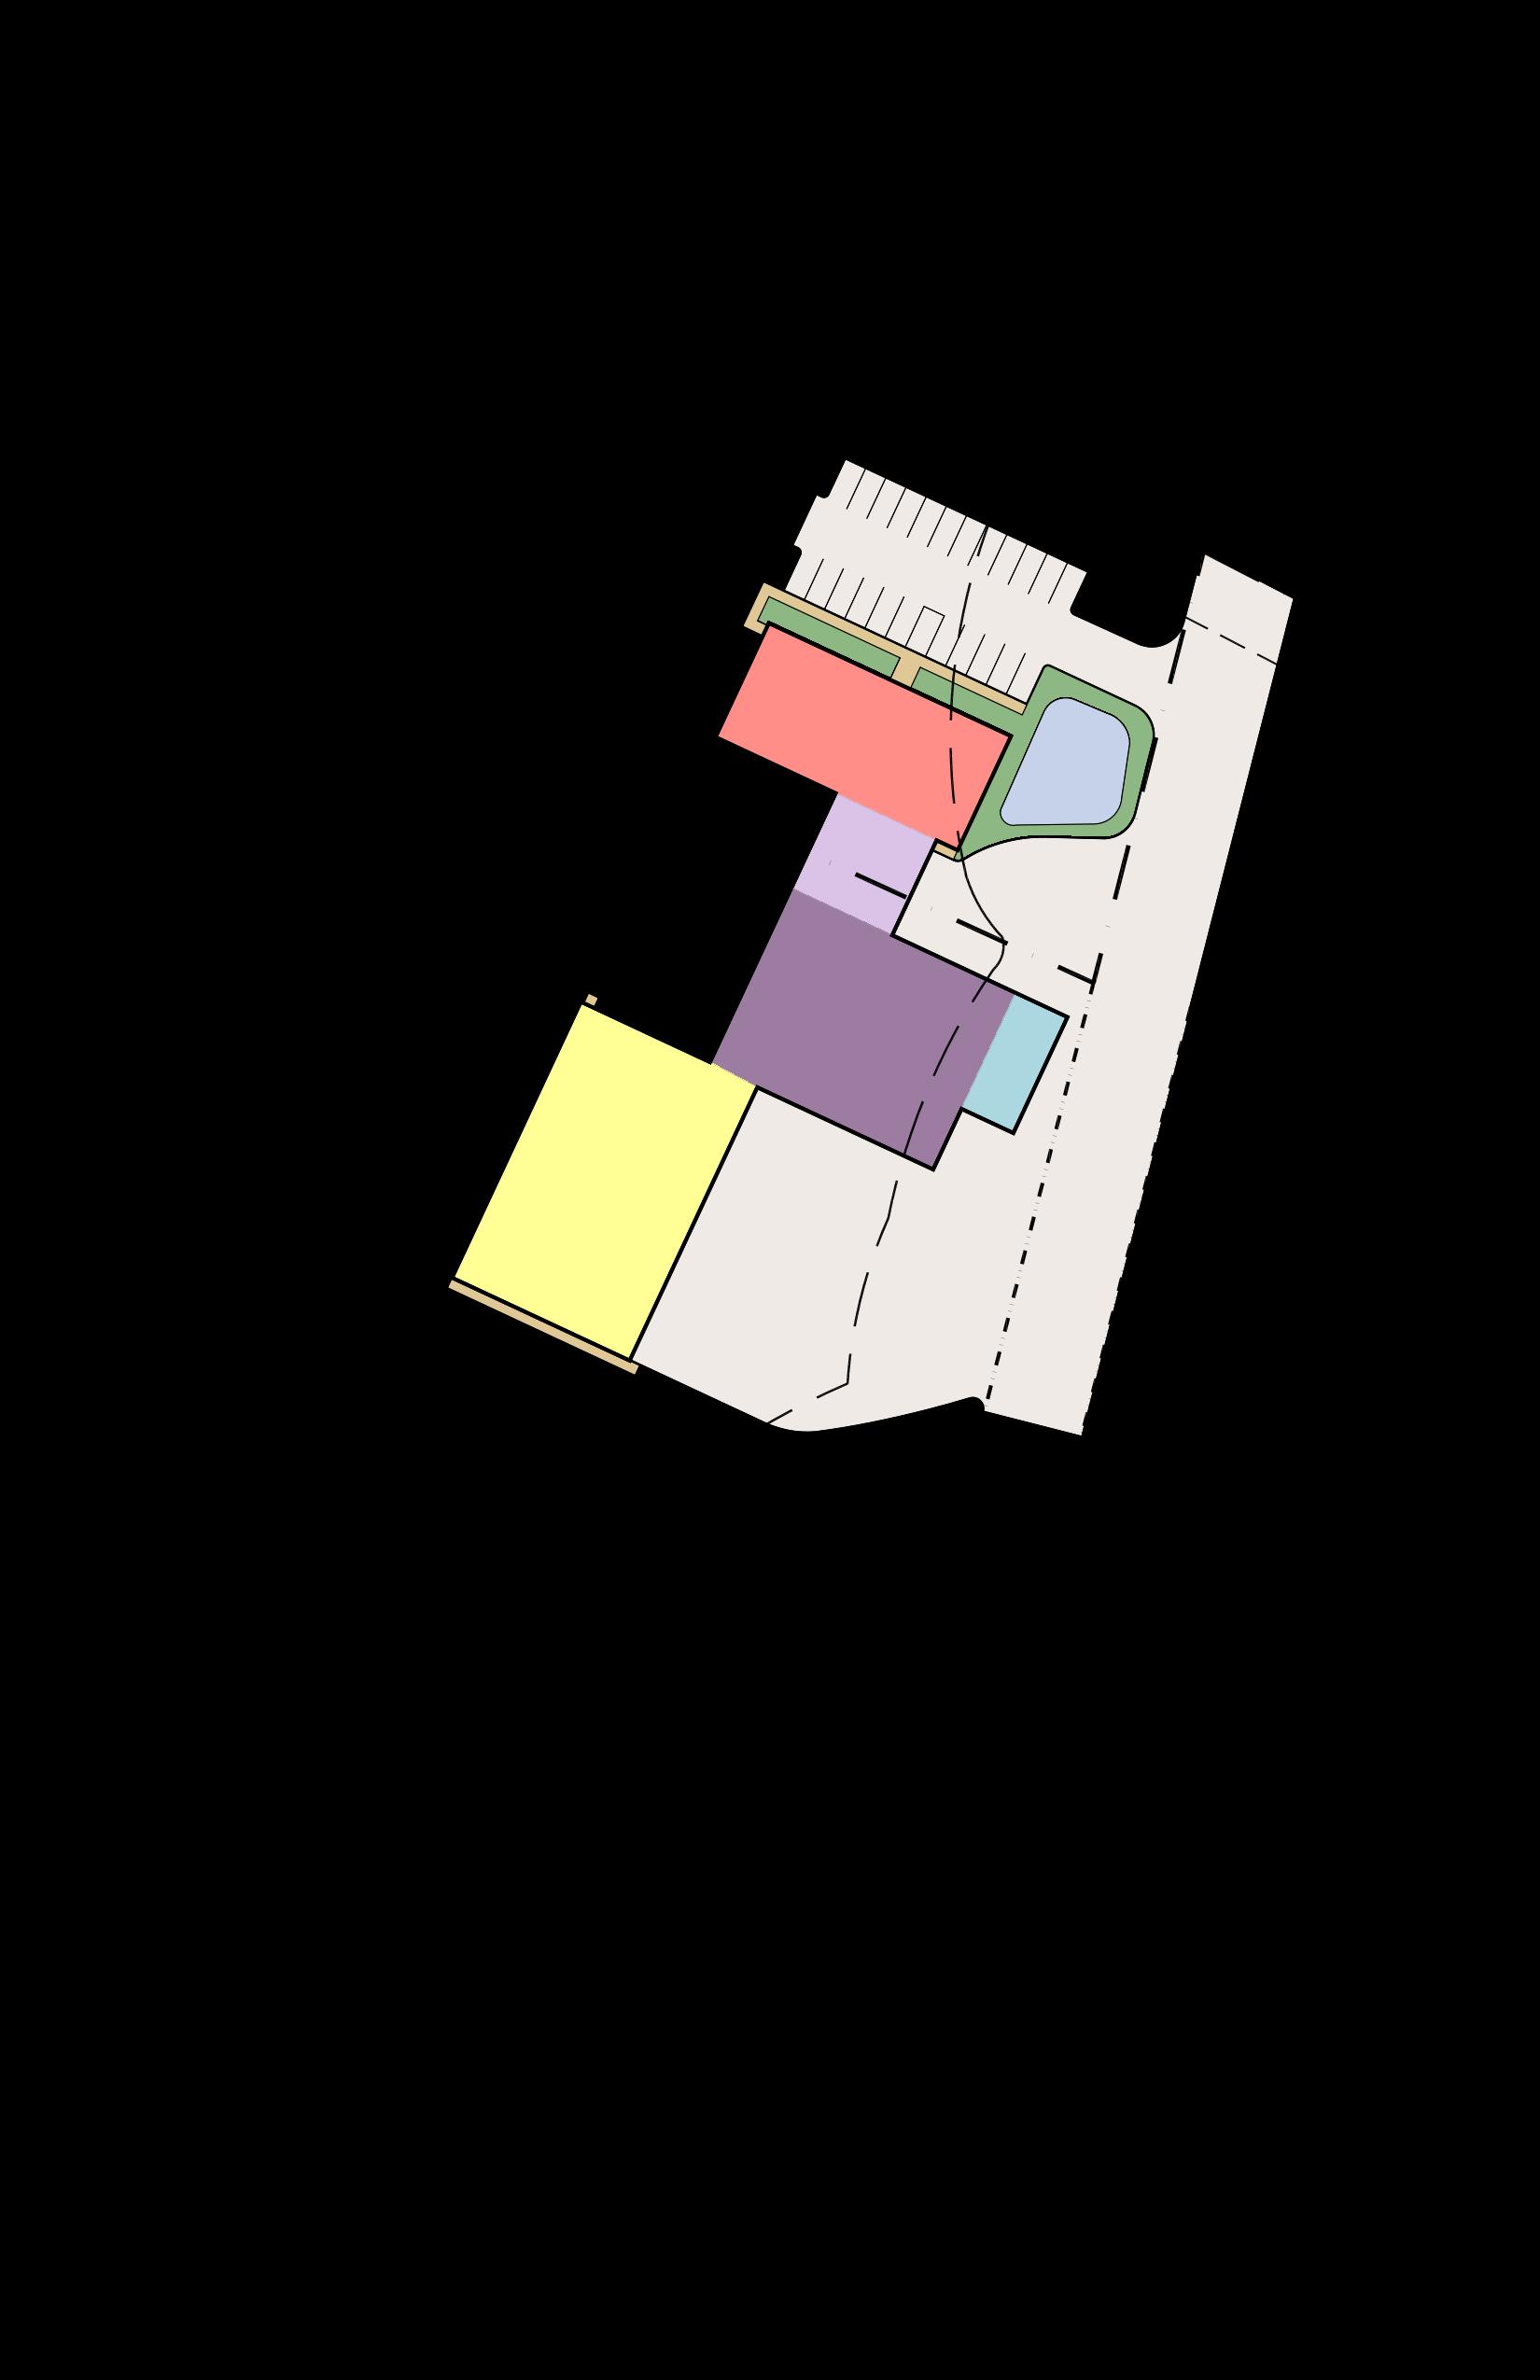 21409 alt Jenness Hill_option 1_colored.png